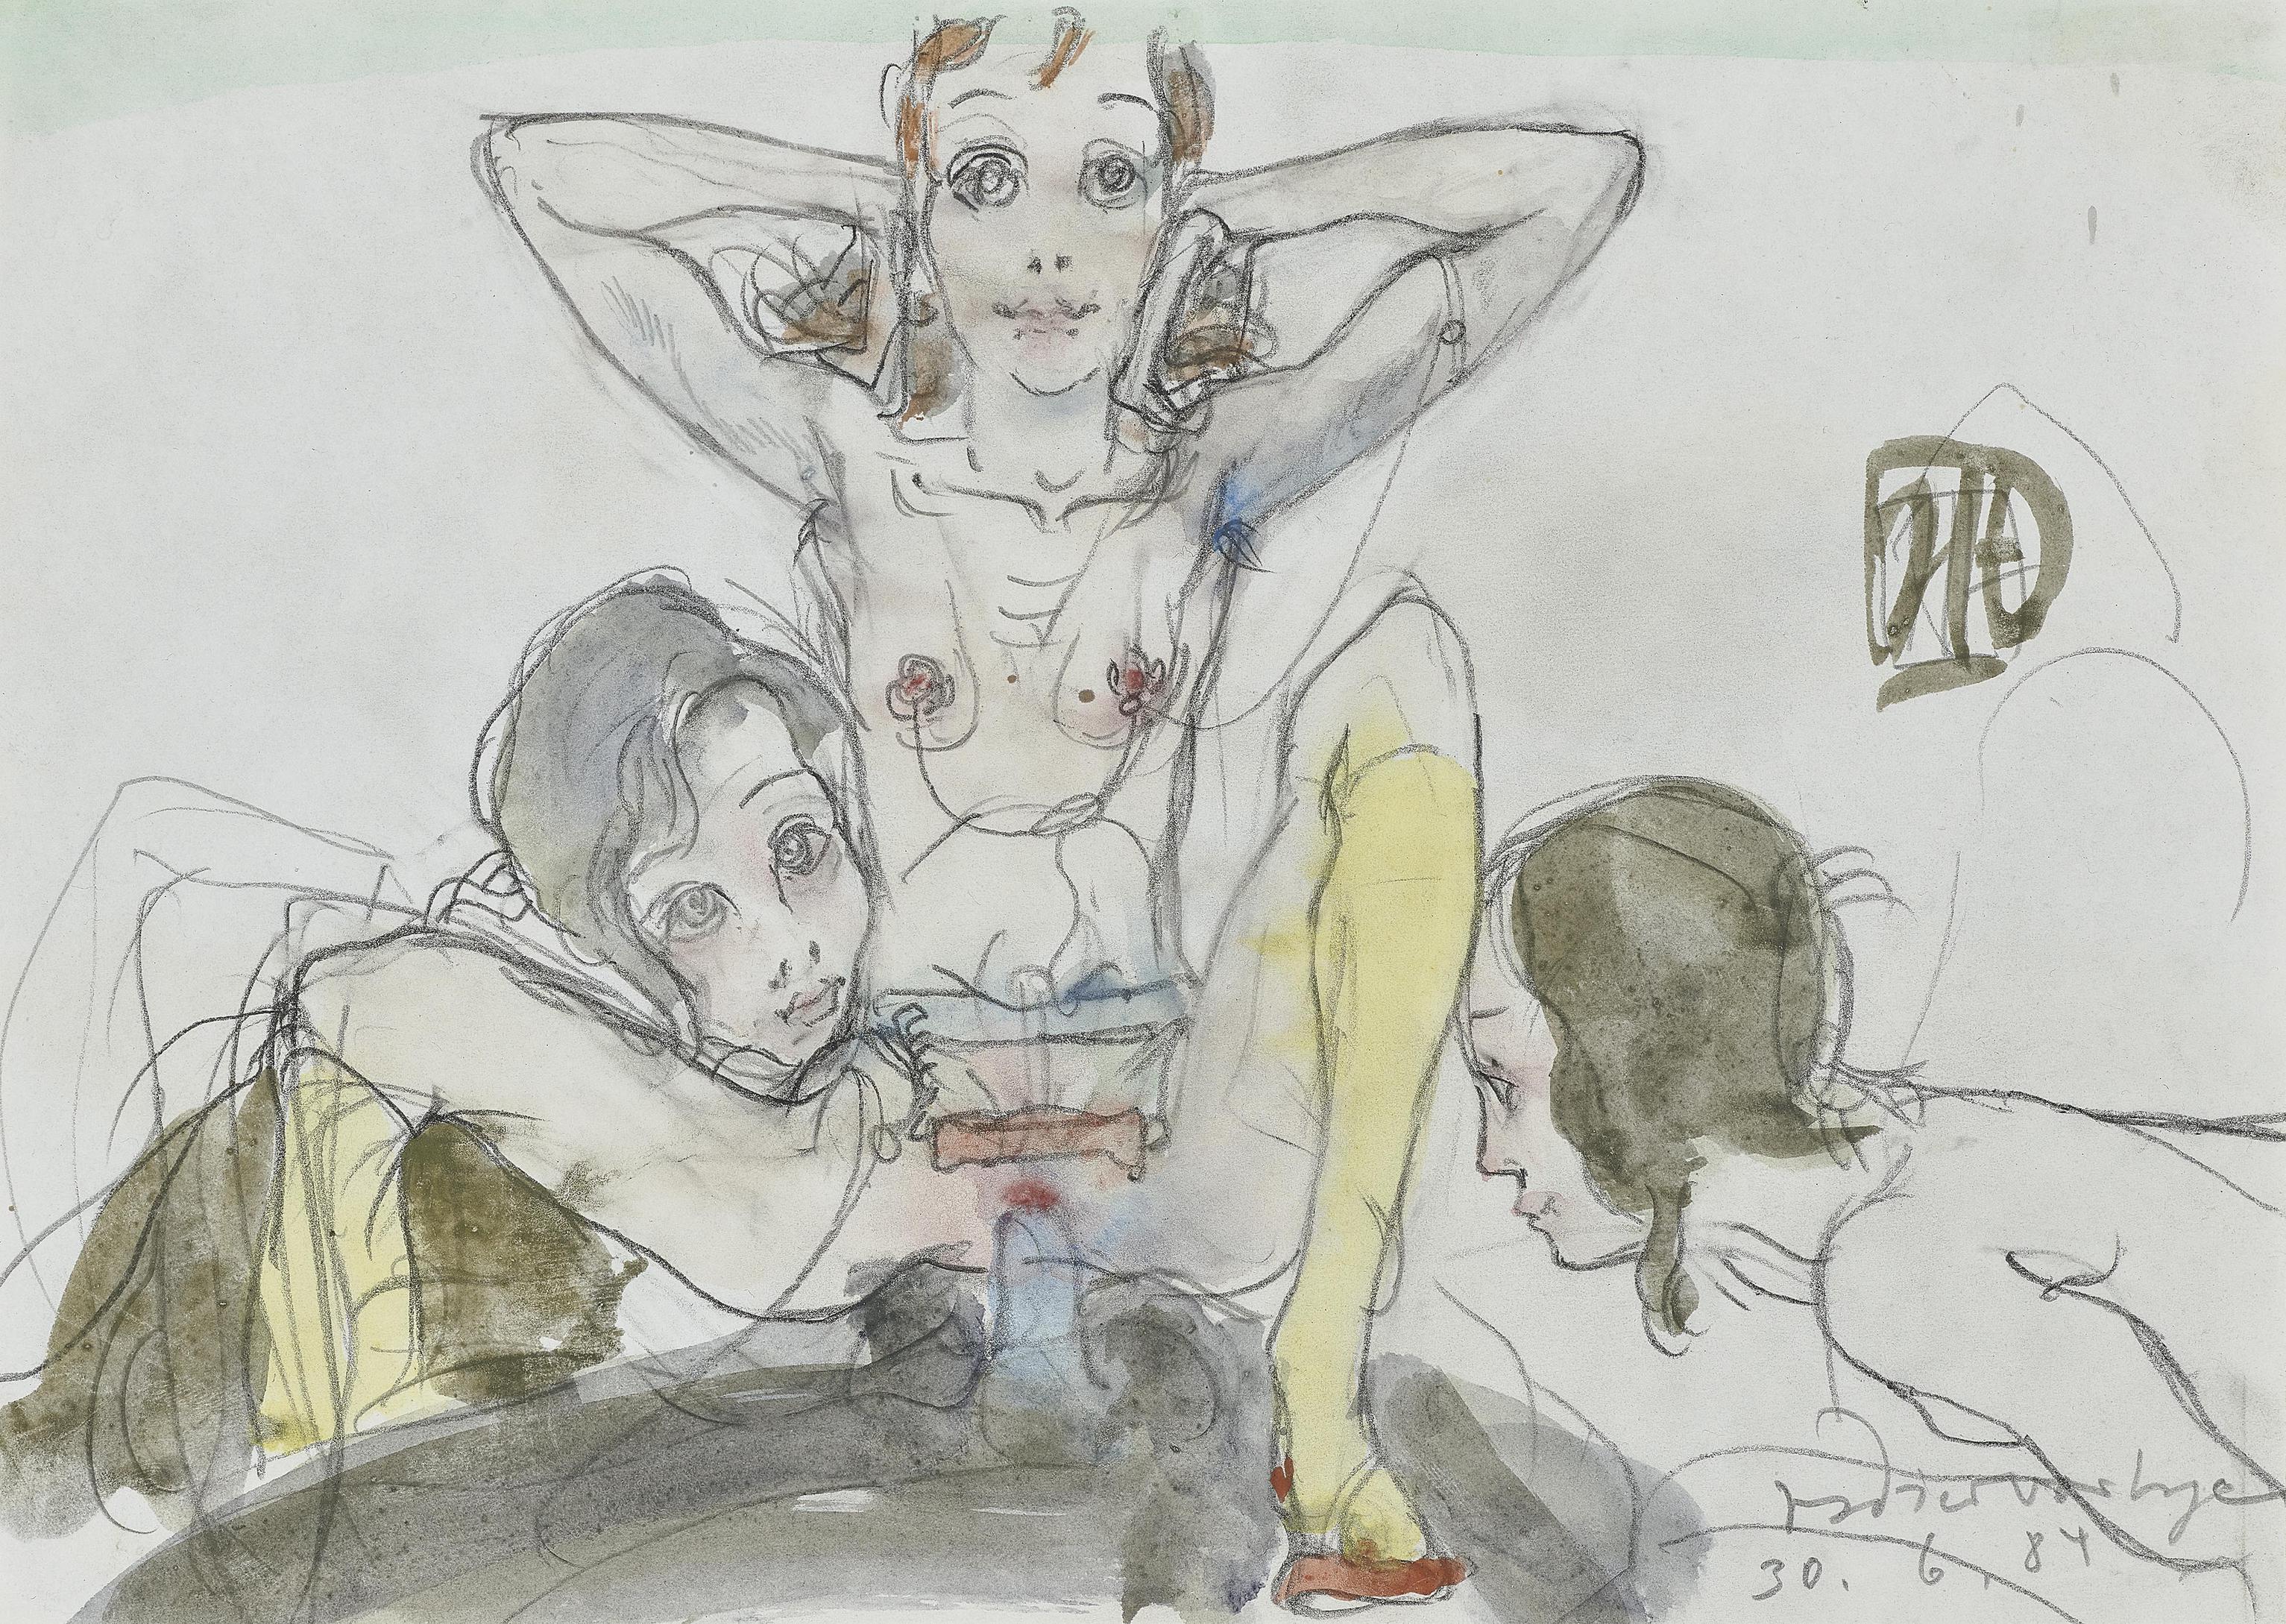 Horst Janssen-Ohne Titel (Dir Birgit Susses Brillenmadchen) / Untitled (For You, Birgit, Cute Glasses Girl)-1984